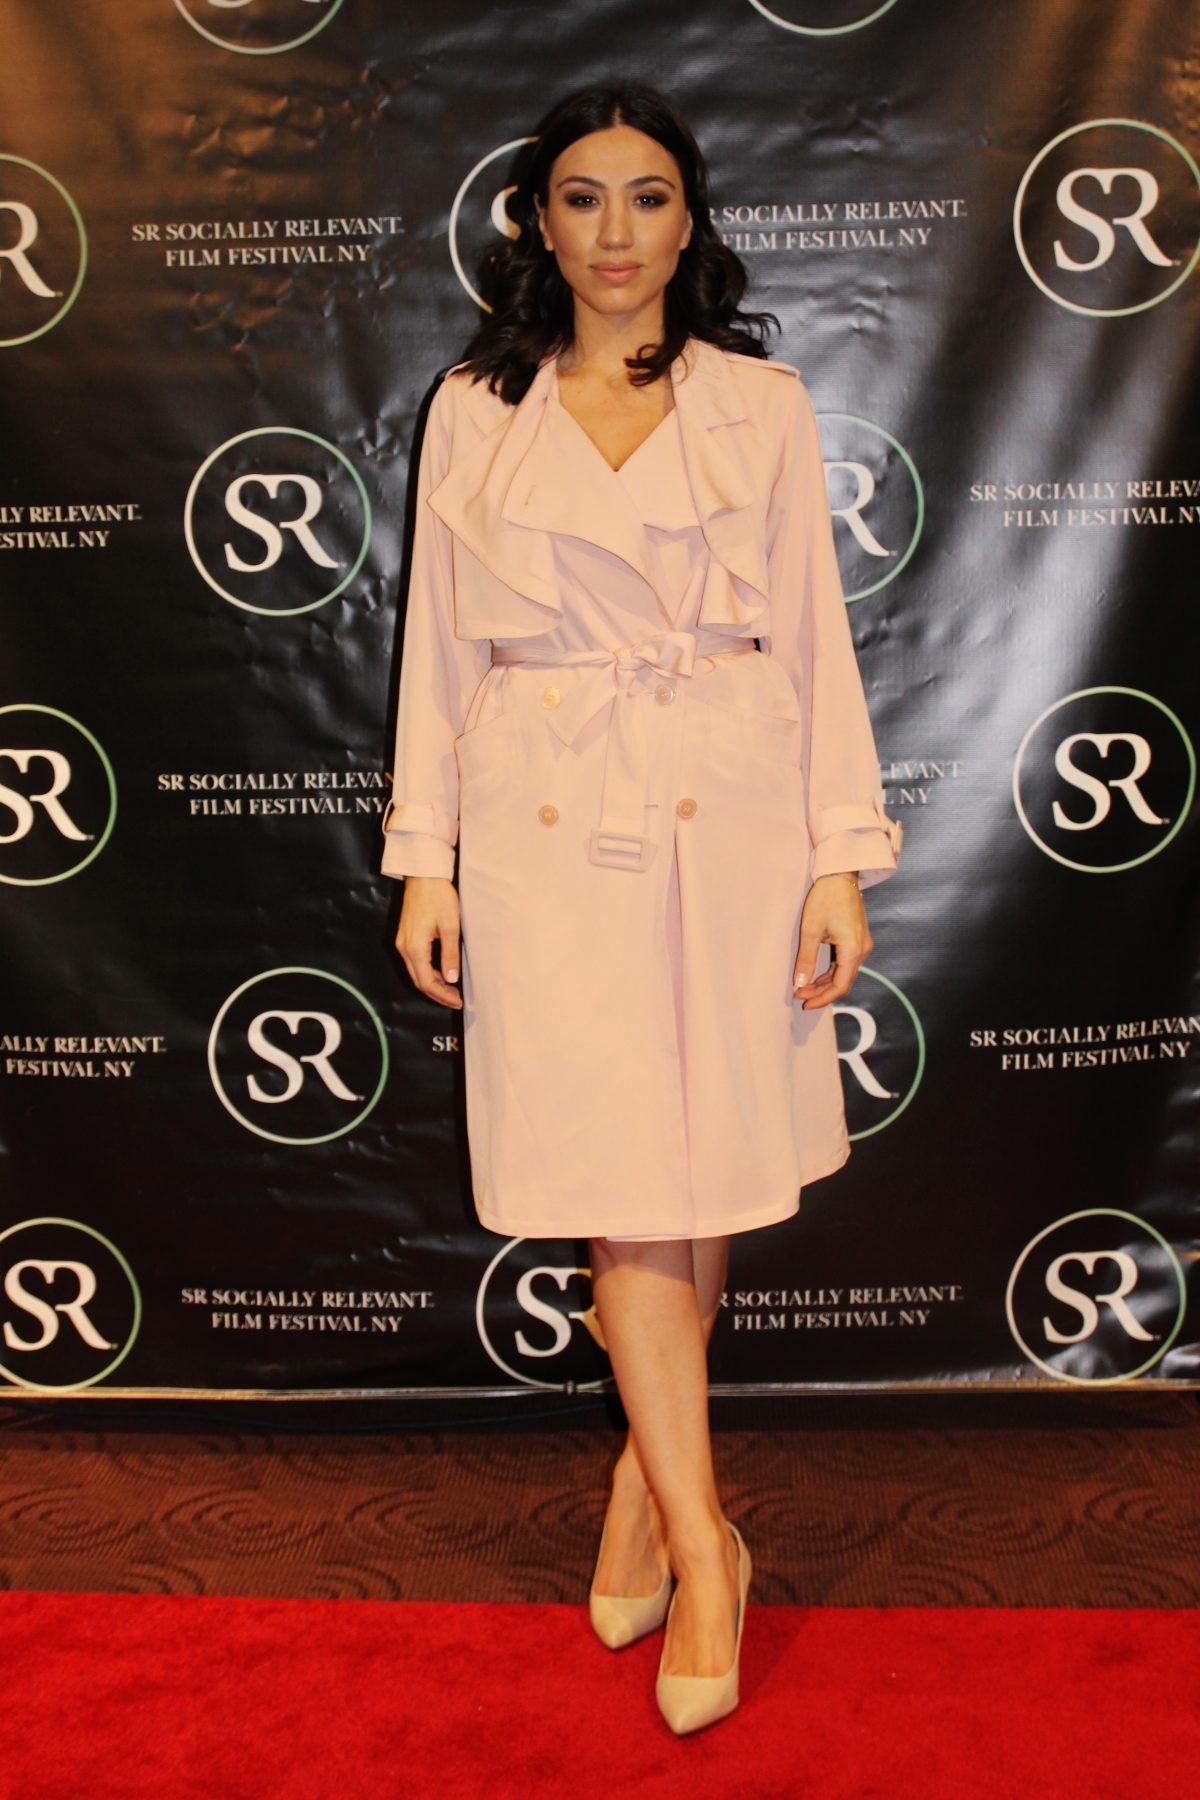 Julie Asriyan at the Socially Relevant Film Festival